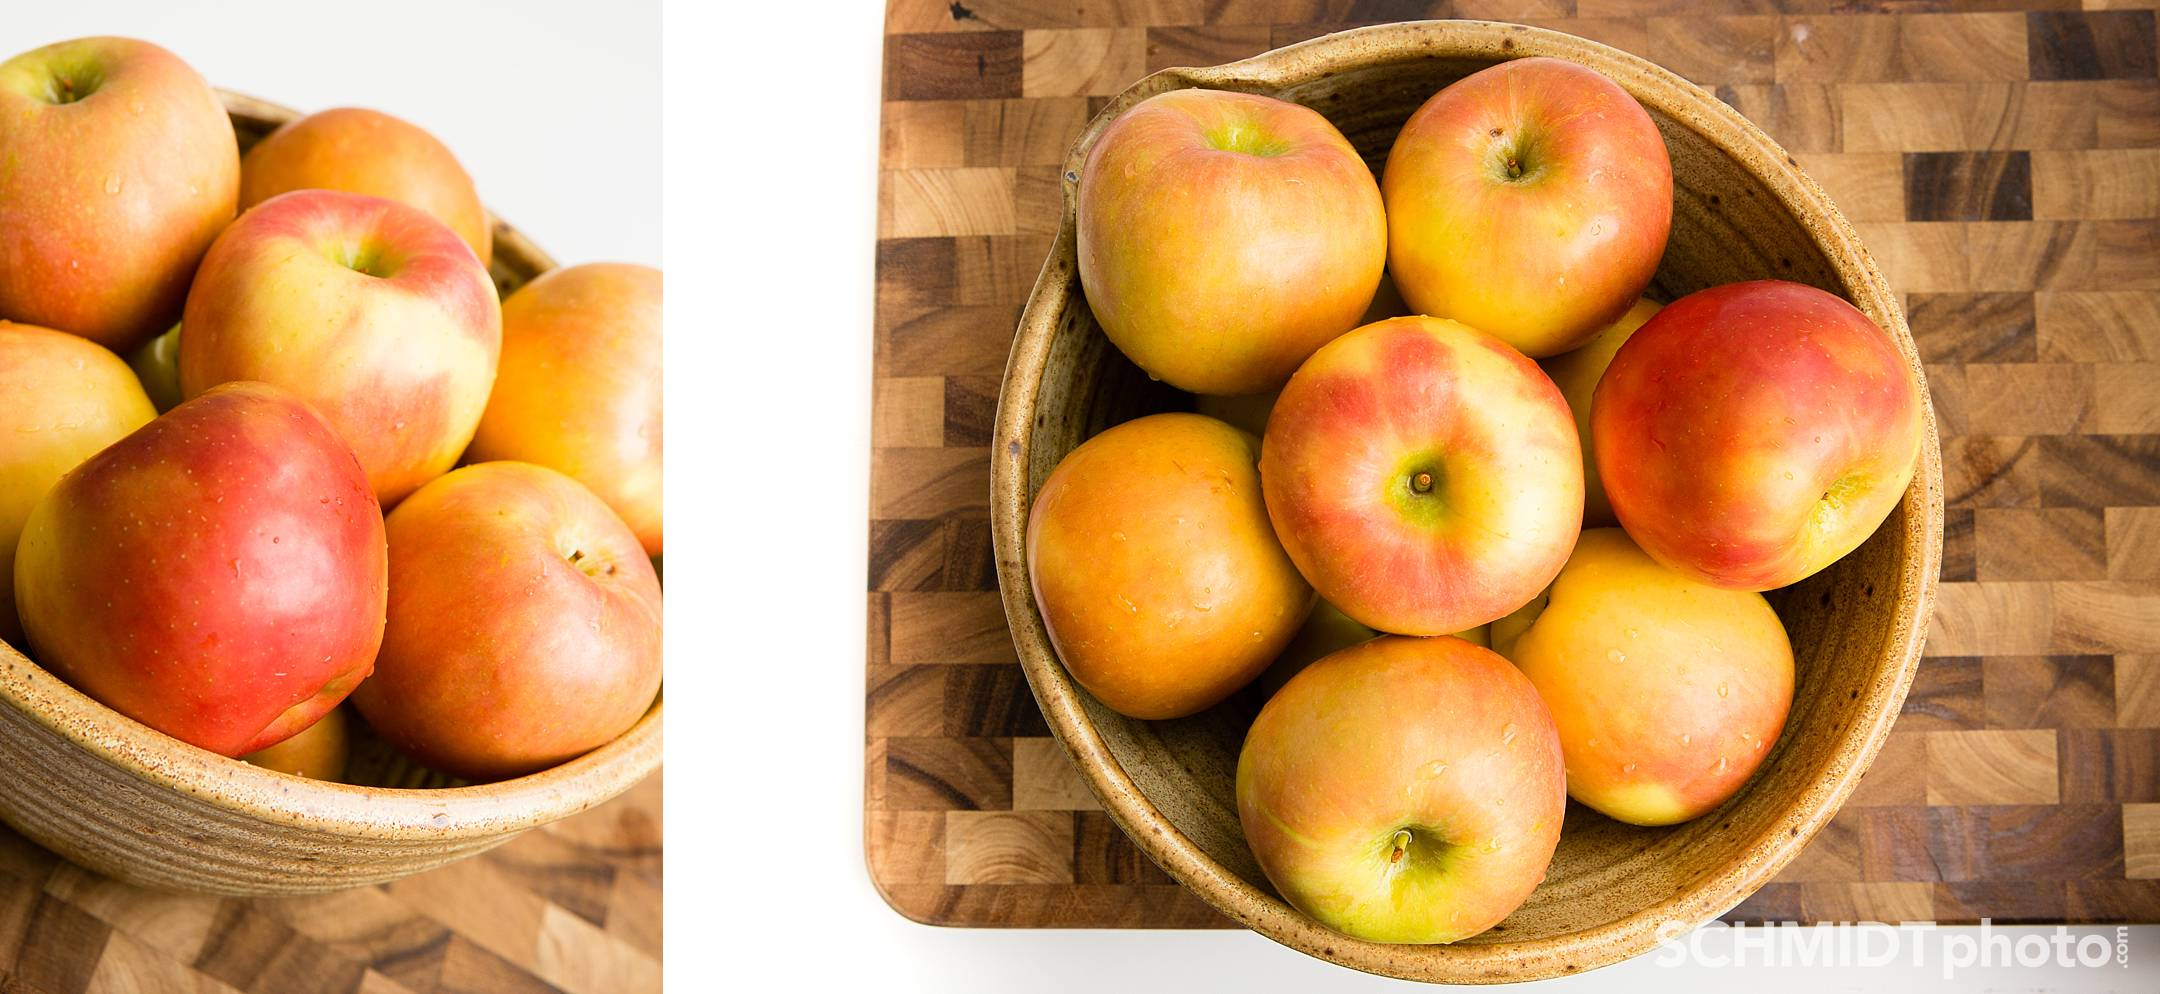 applesauce-homemade-easy-eat-with-tom-foodblog-schmidt-photo_2094